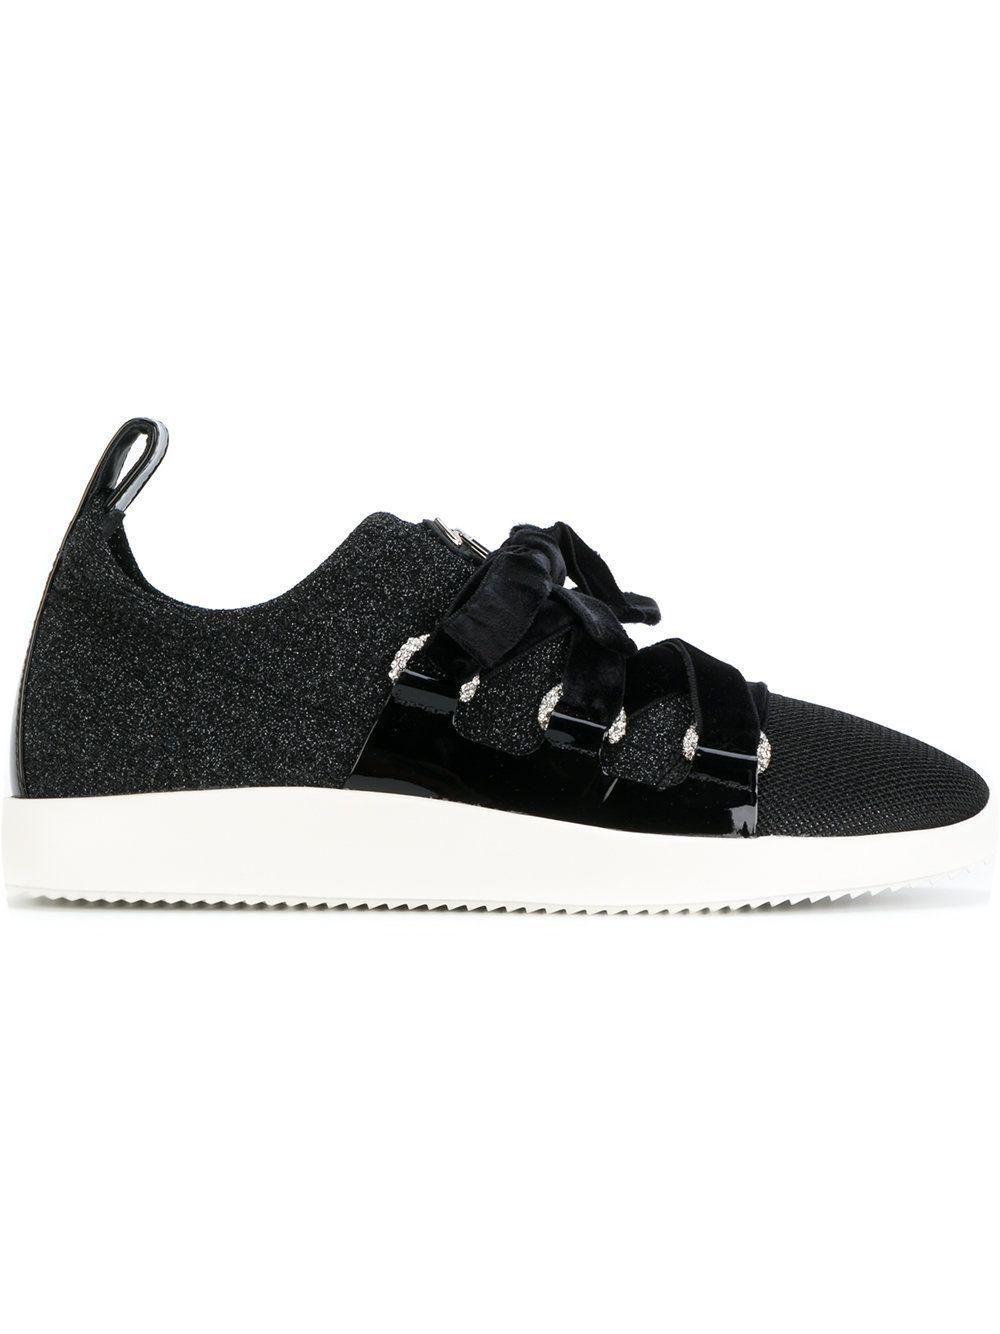 Giuseppe Zanotti Design Maggie velvet lace sneakers online sale sale 100% authentic cheap wholesale price latest collections online t9bAd6M5JW